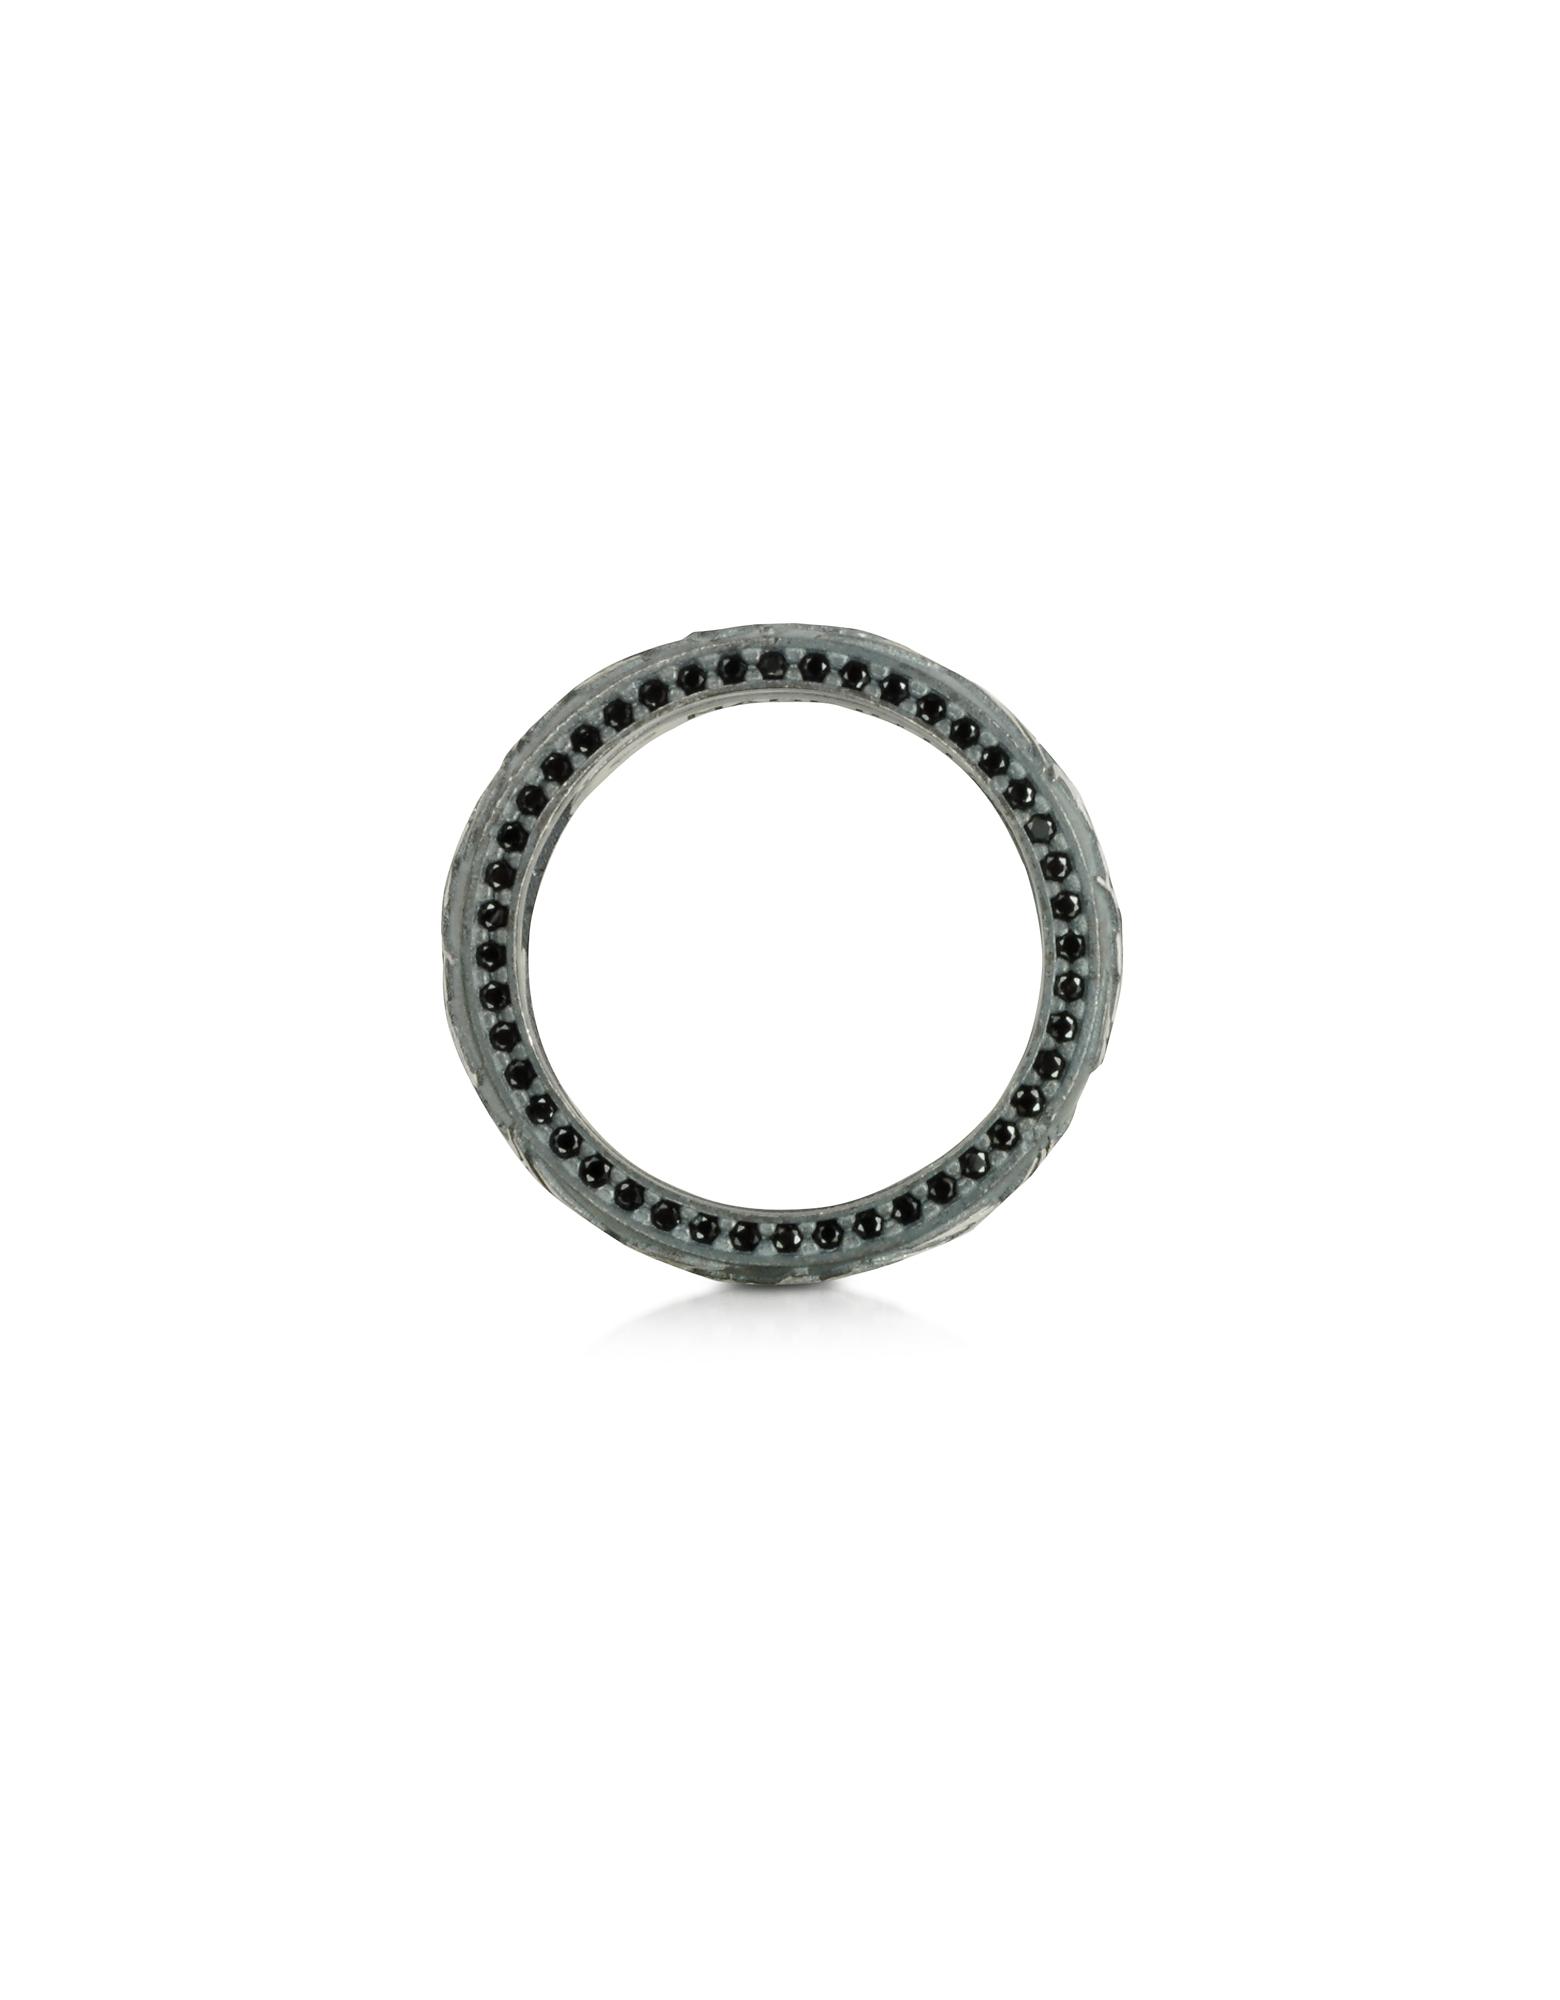 Bassorilievo Silver and Zircon Men's Ring от Forzieri.com INT